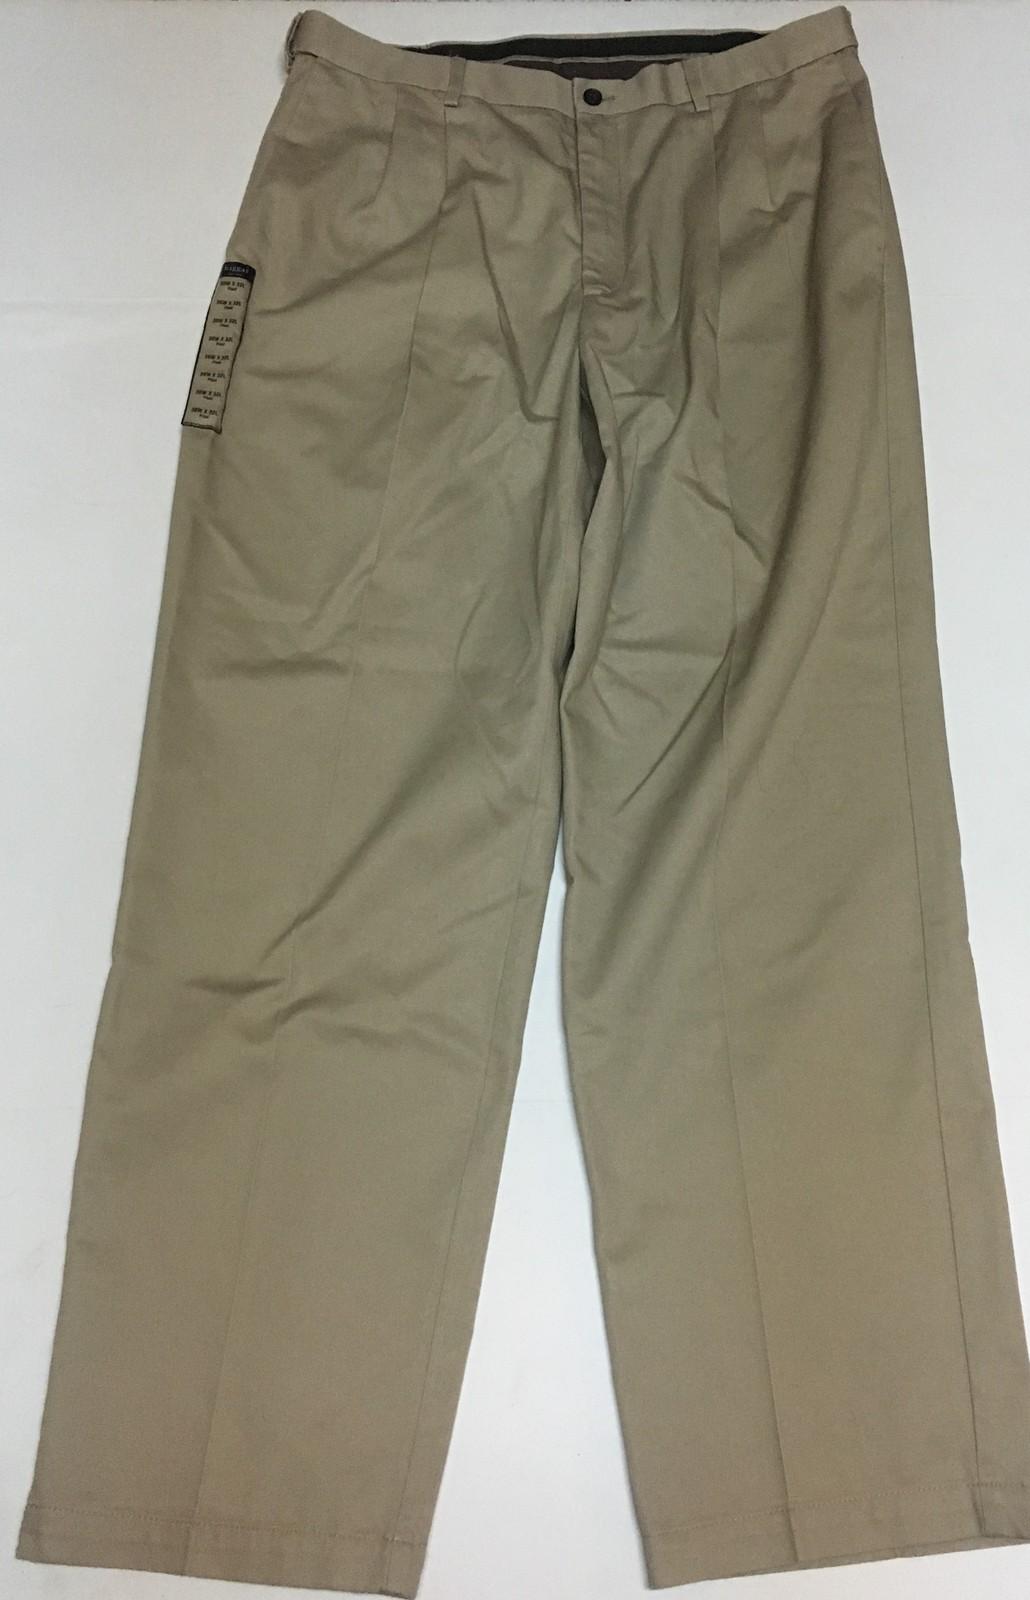 Haggar Men's Classic Fit Khaki Beige Pants No Iron W2W 36 x 32 NWT